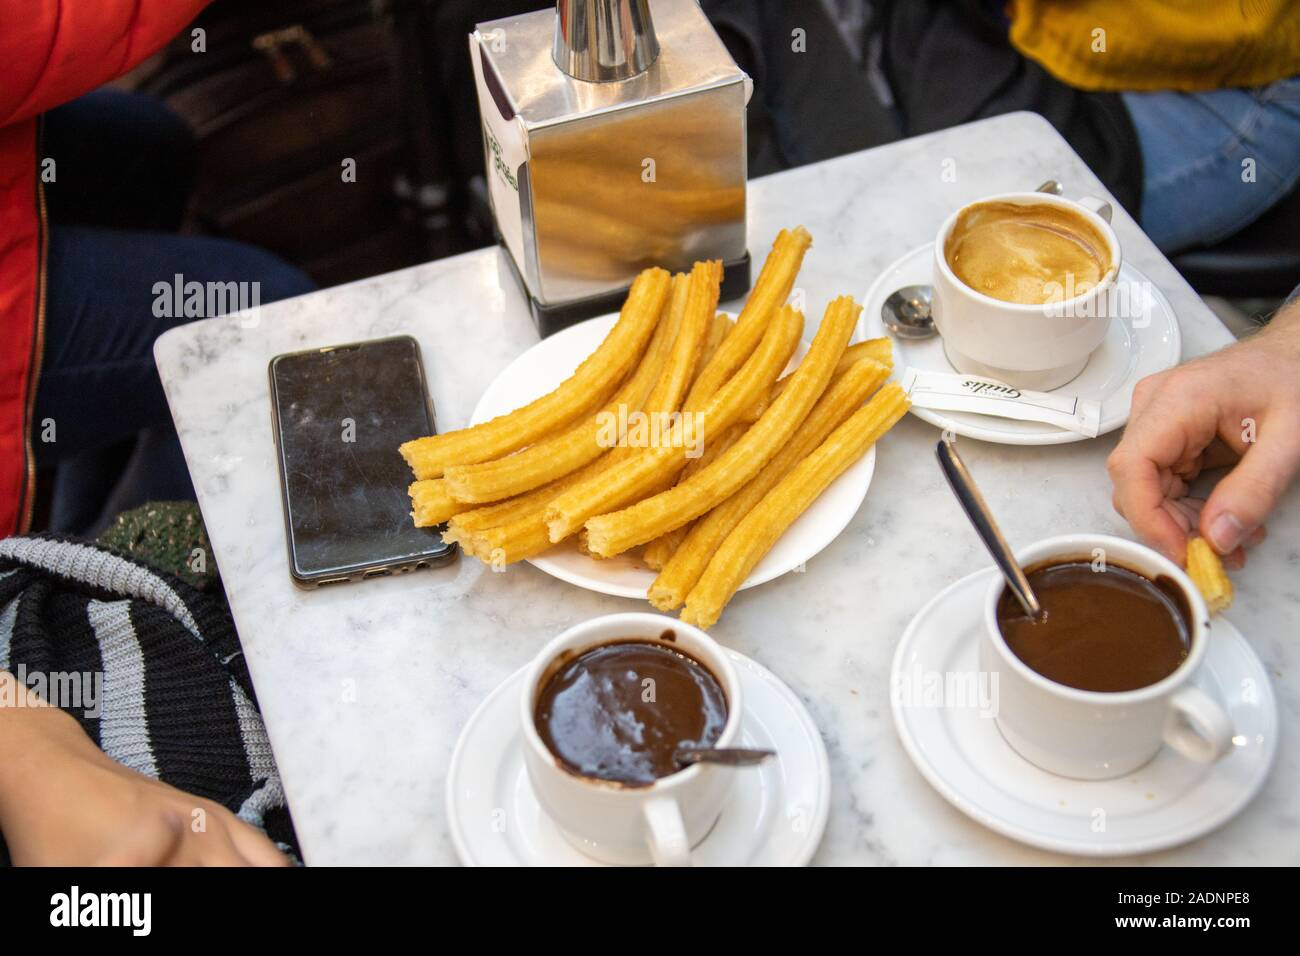 Mi cafetería. Churros-y-chocolate-chocolateria-san-gines-madrid-espana-2adnpe8